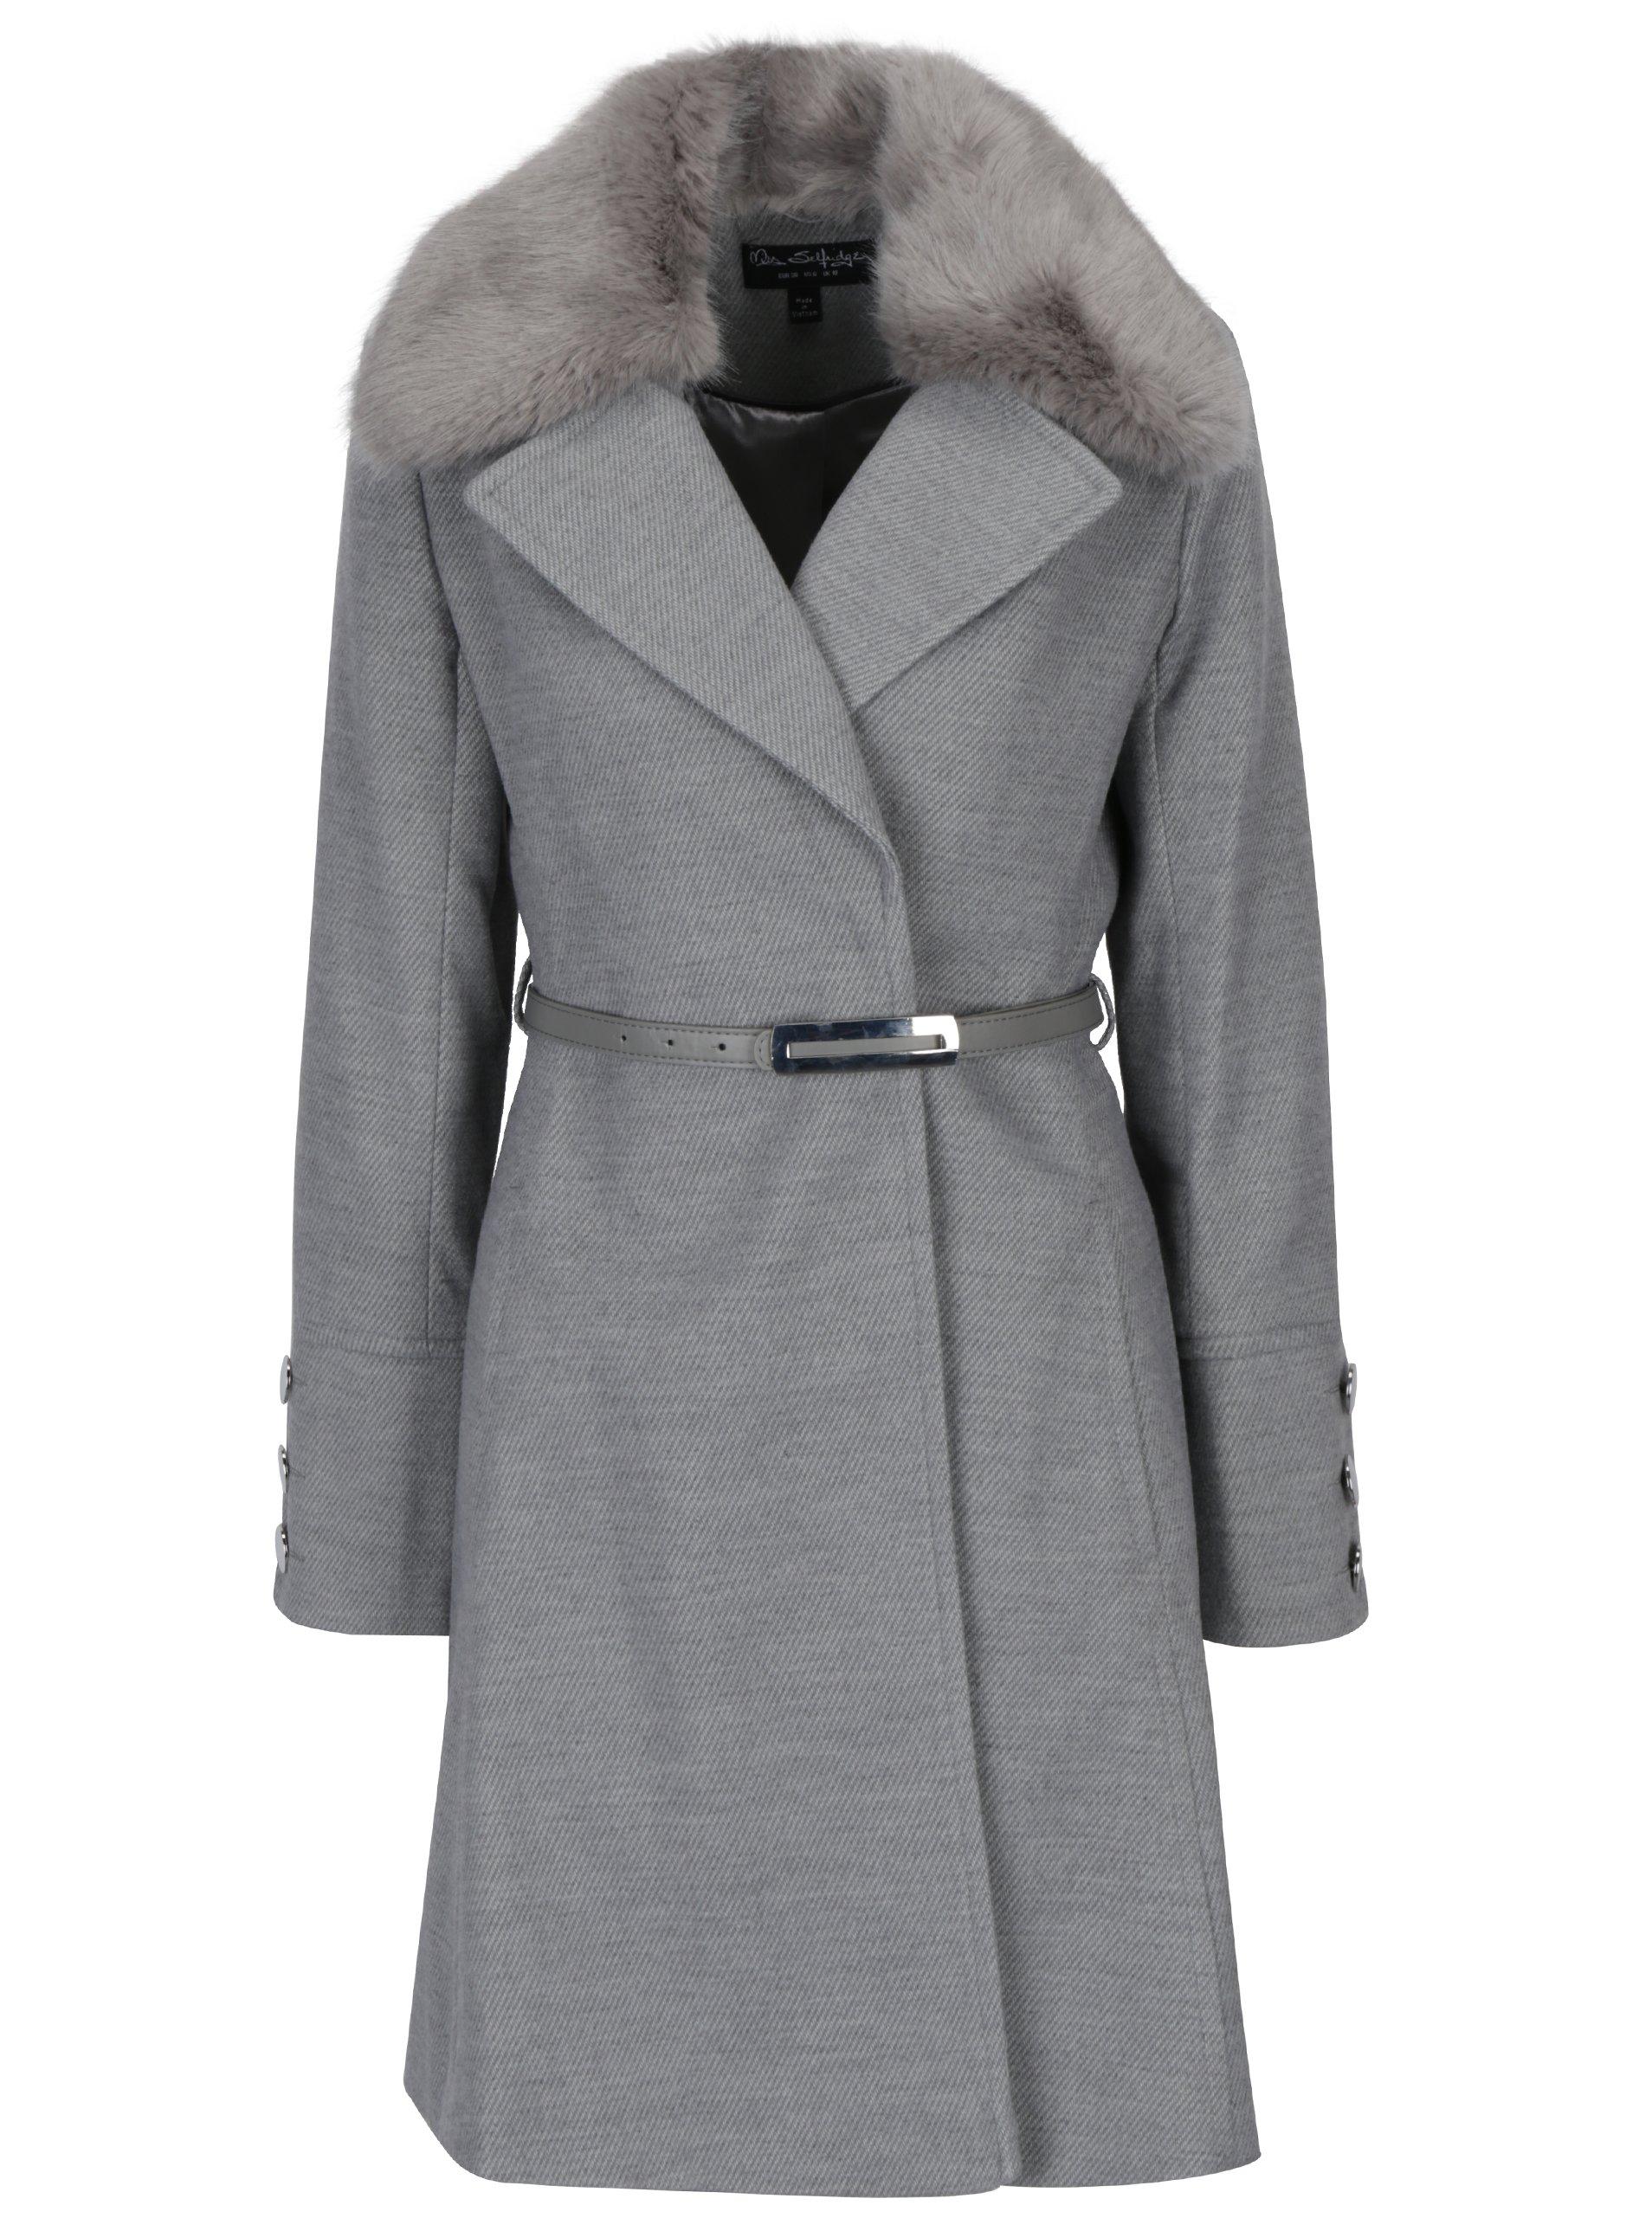 Šedý kabát s páskem a umělým kožíškem Miss Selfridge